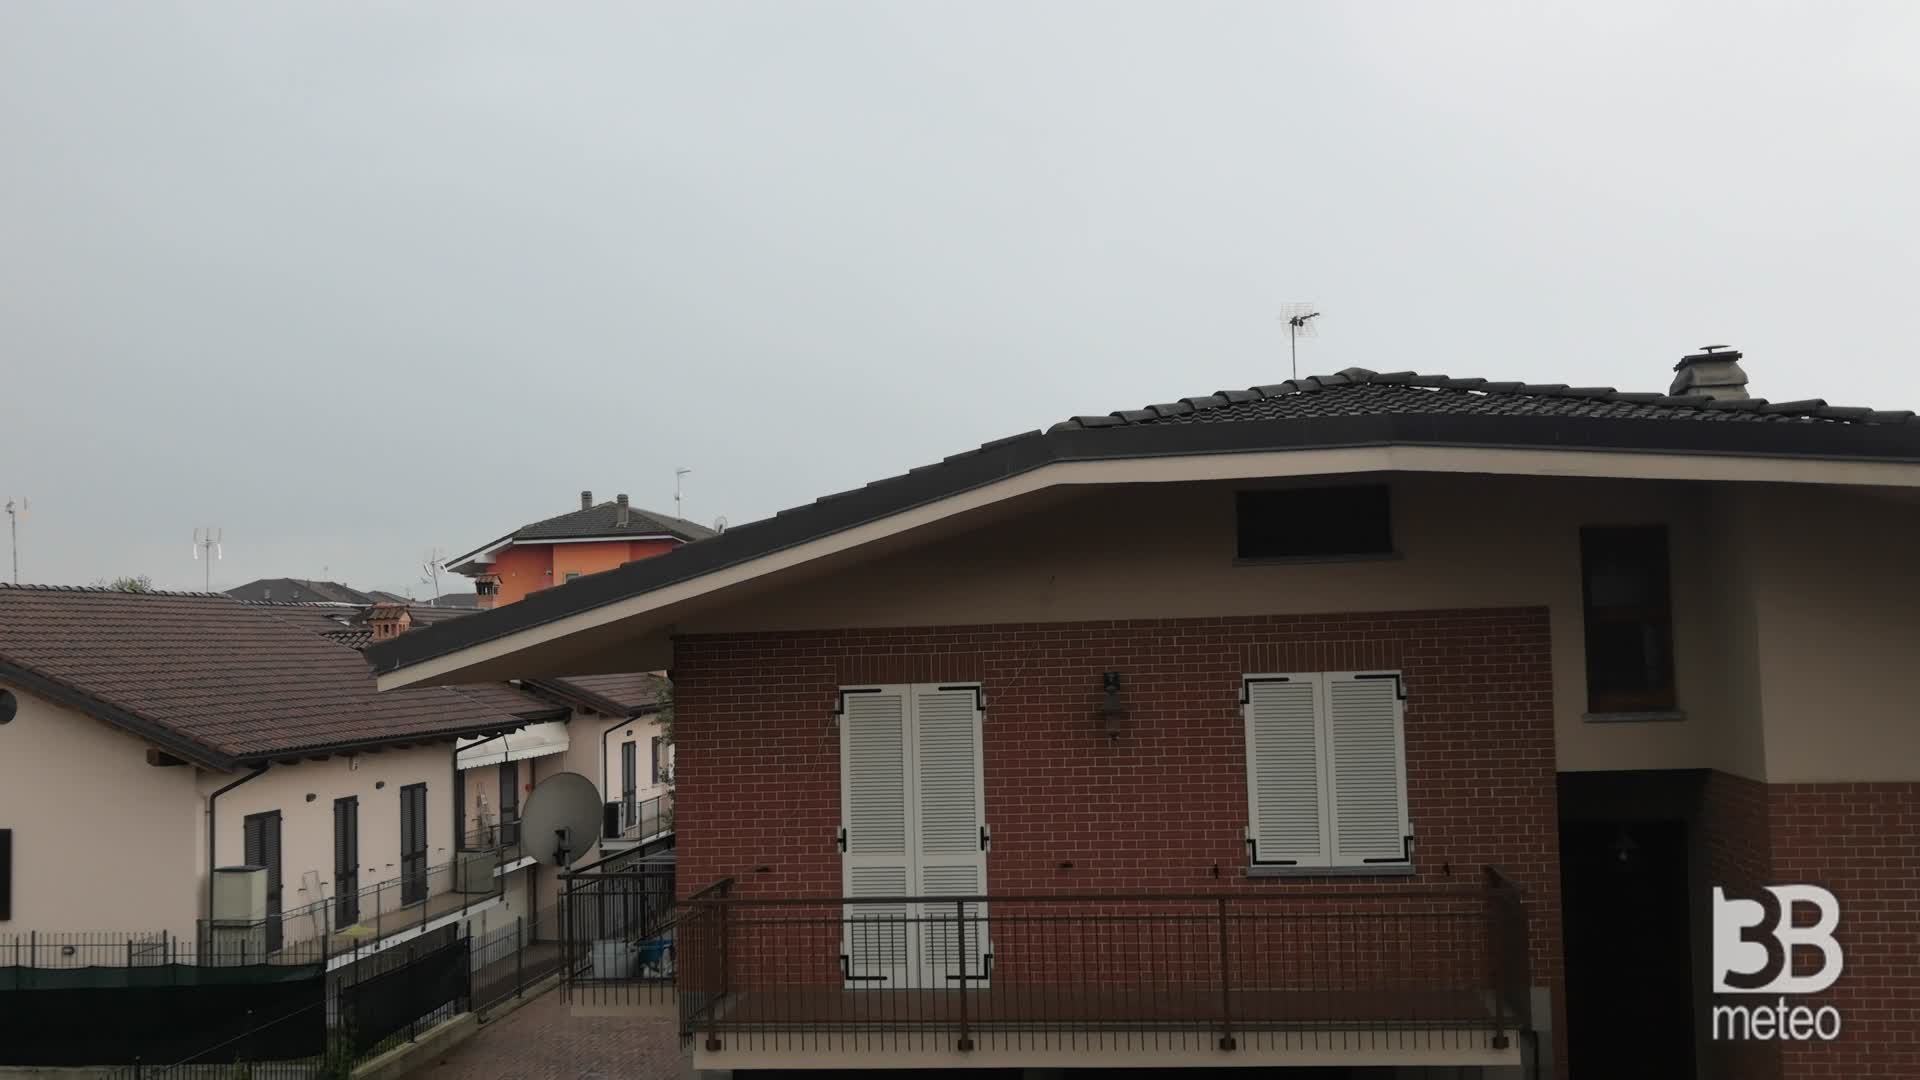 Cronaca METEO VIDEO, pioggia sul basso Piemonte